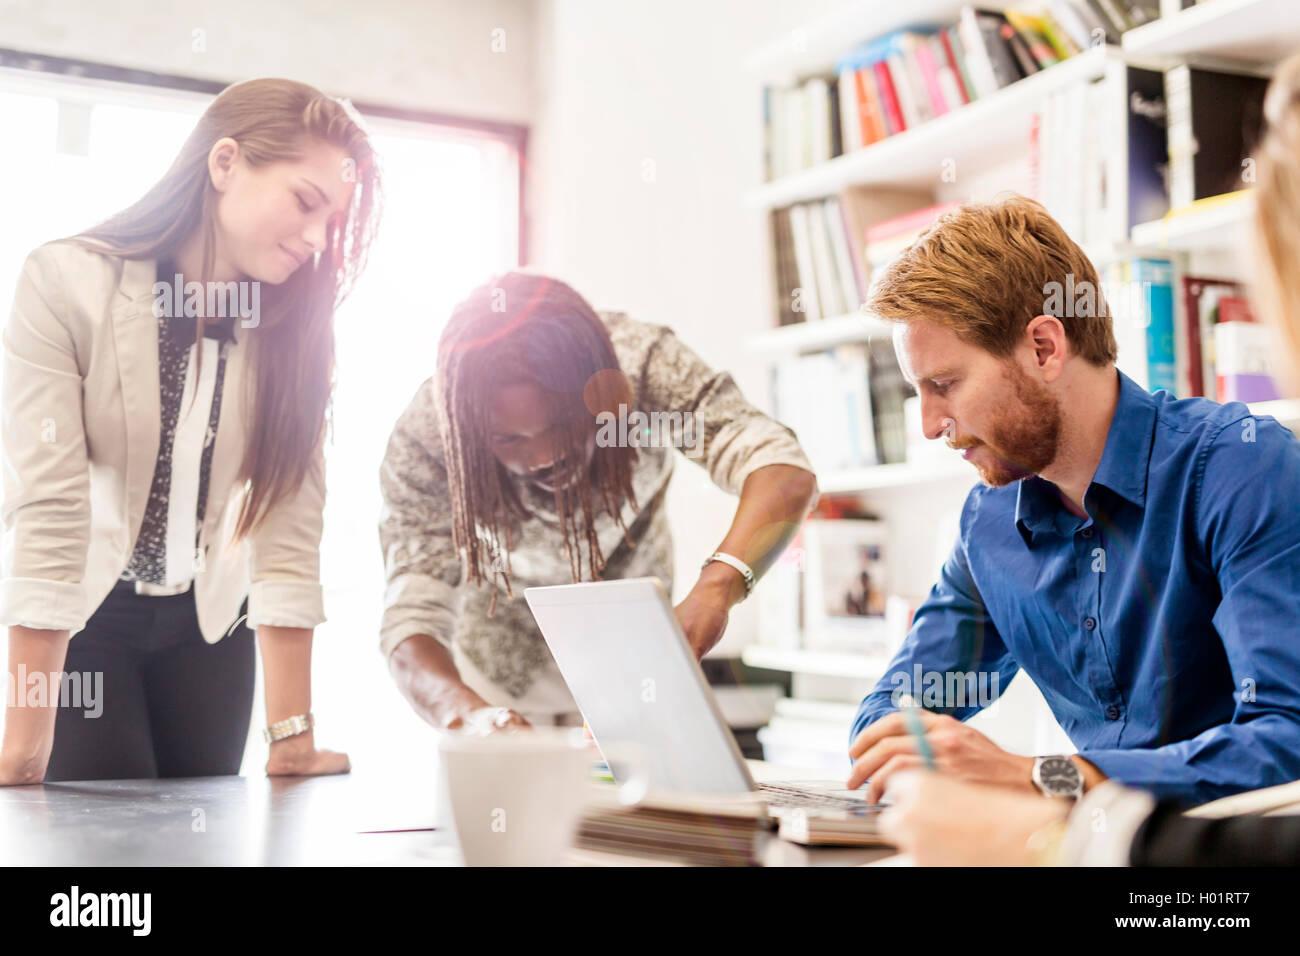 Brainstorming between colleagues at work - Stock Image